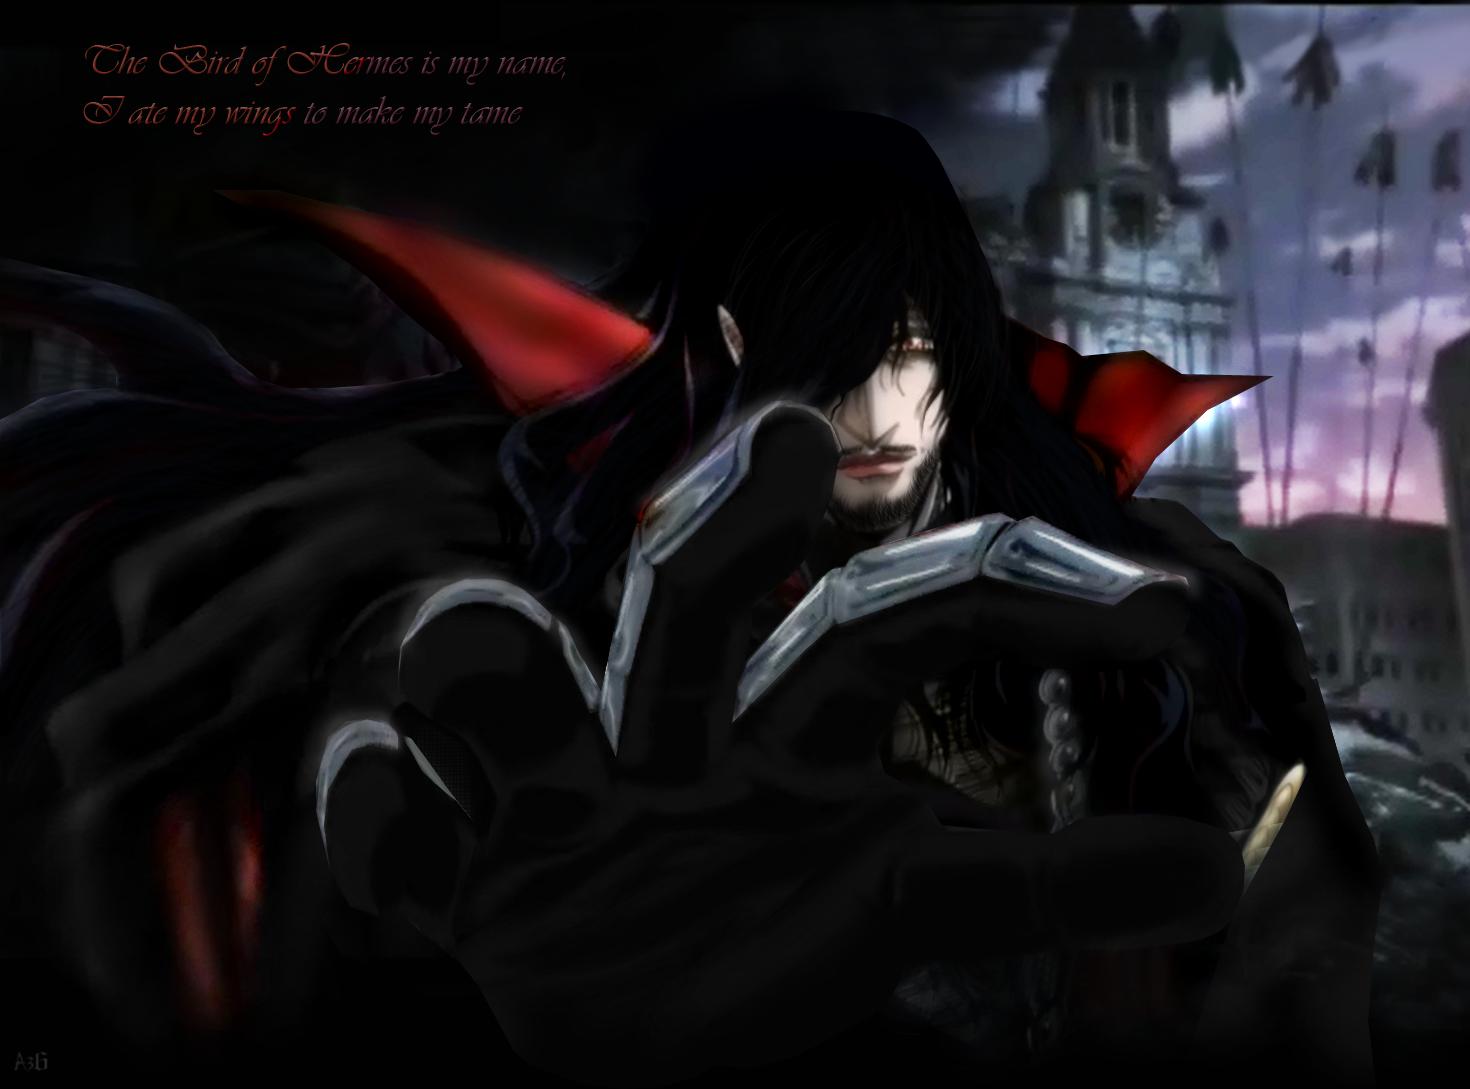 Hellsing Alucard Level 0 | ... de la peña otaku marteña ...